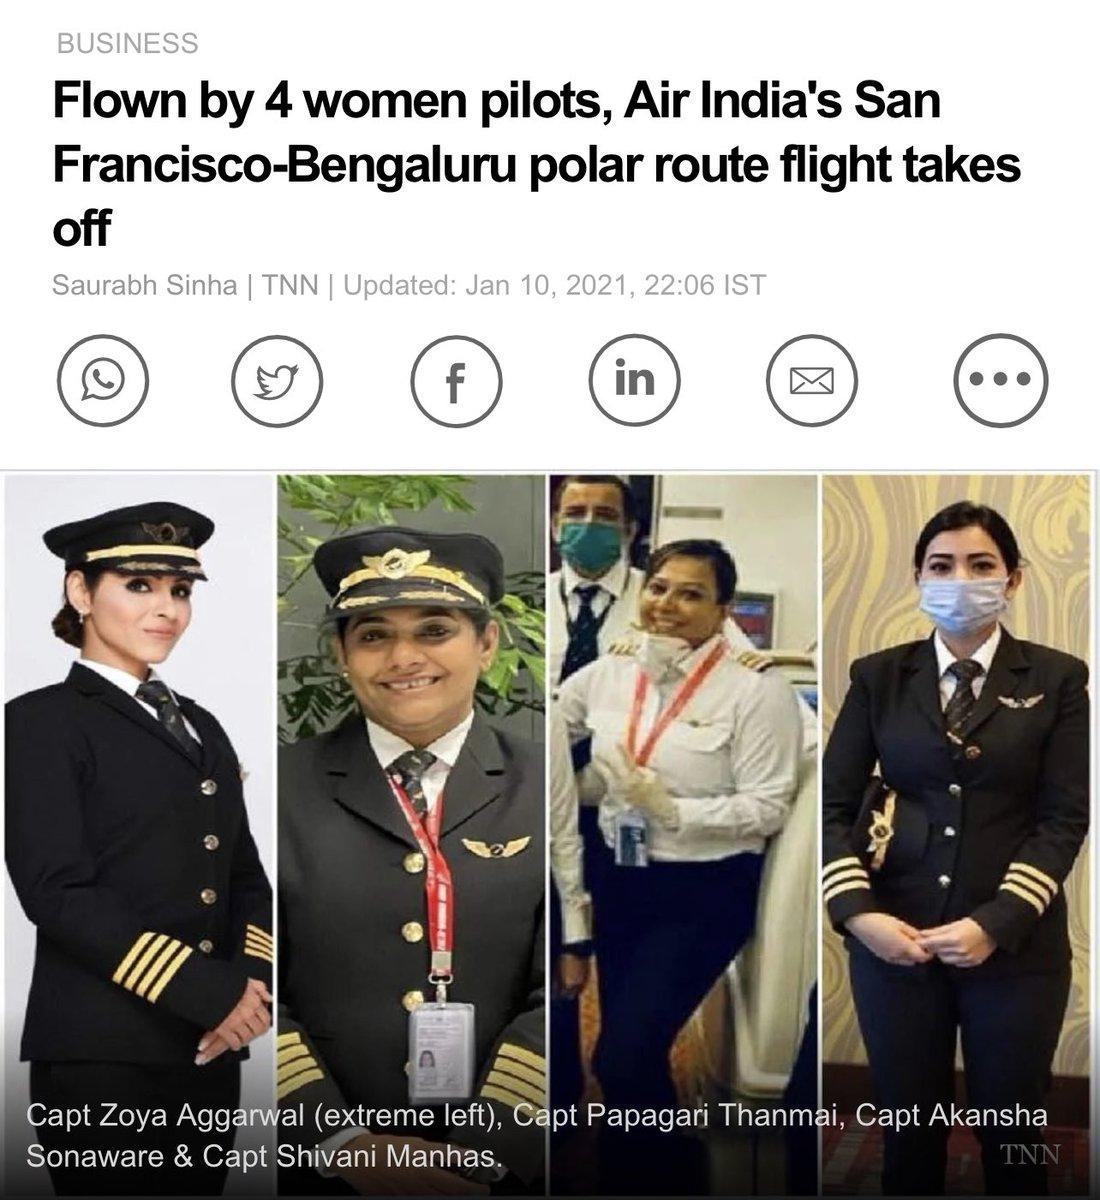 Jug Jug Jeen Dhiyan 🙏🏽  Captain Zoya Aggarwal, Capt Papagari Thanmai, Capt Akansha Sonaware & Capt Shivani Manhas 😊👏🏽👏🏽  Sanu Sareyan Nu Tuadey te Maan Hai ✊🏽